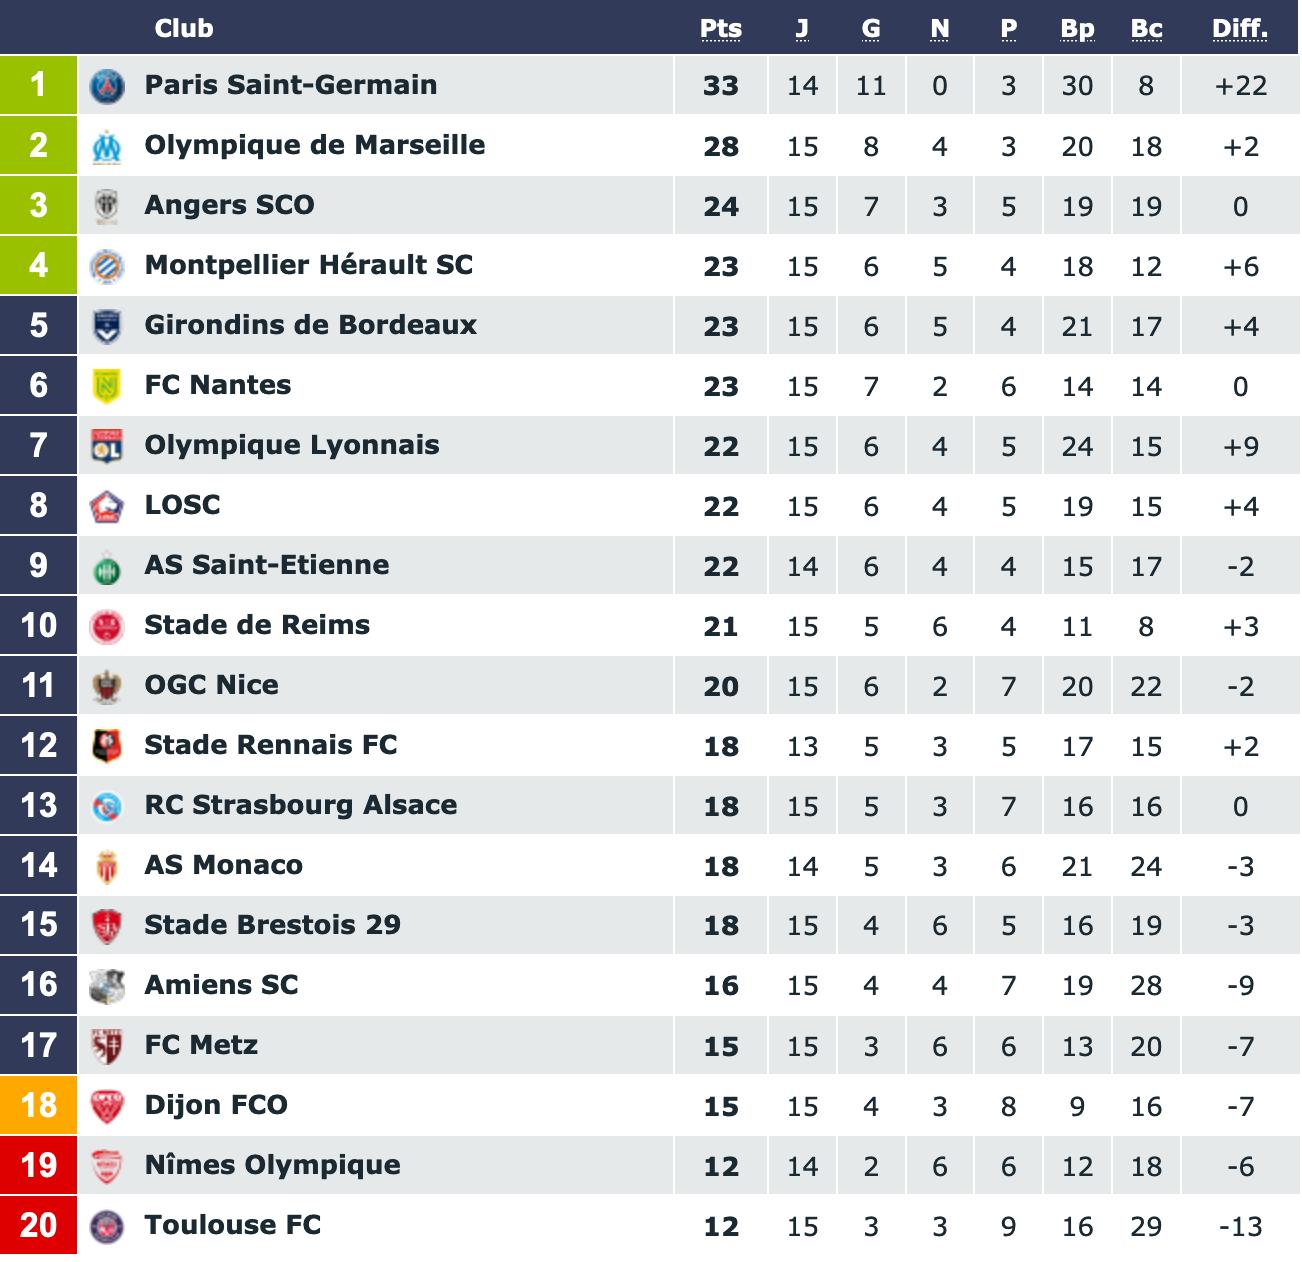 Screenshot_2019-12-01 Classement Ligue 1 Conforama saison 2019 2020.png (231 KB)